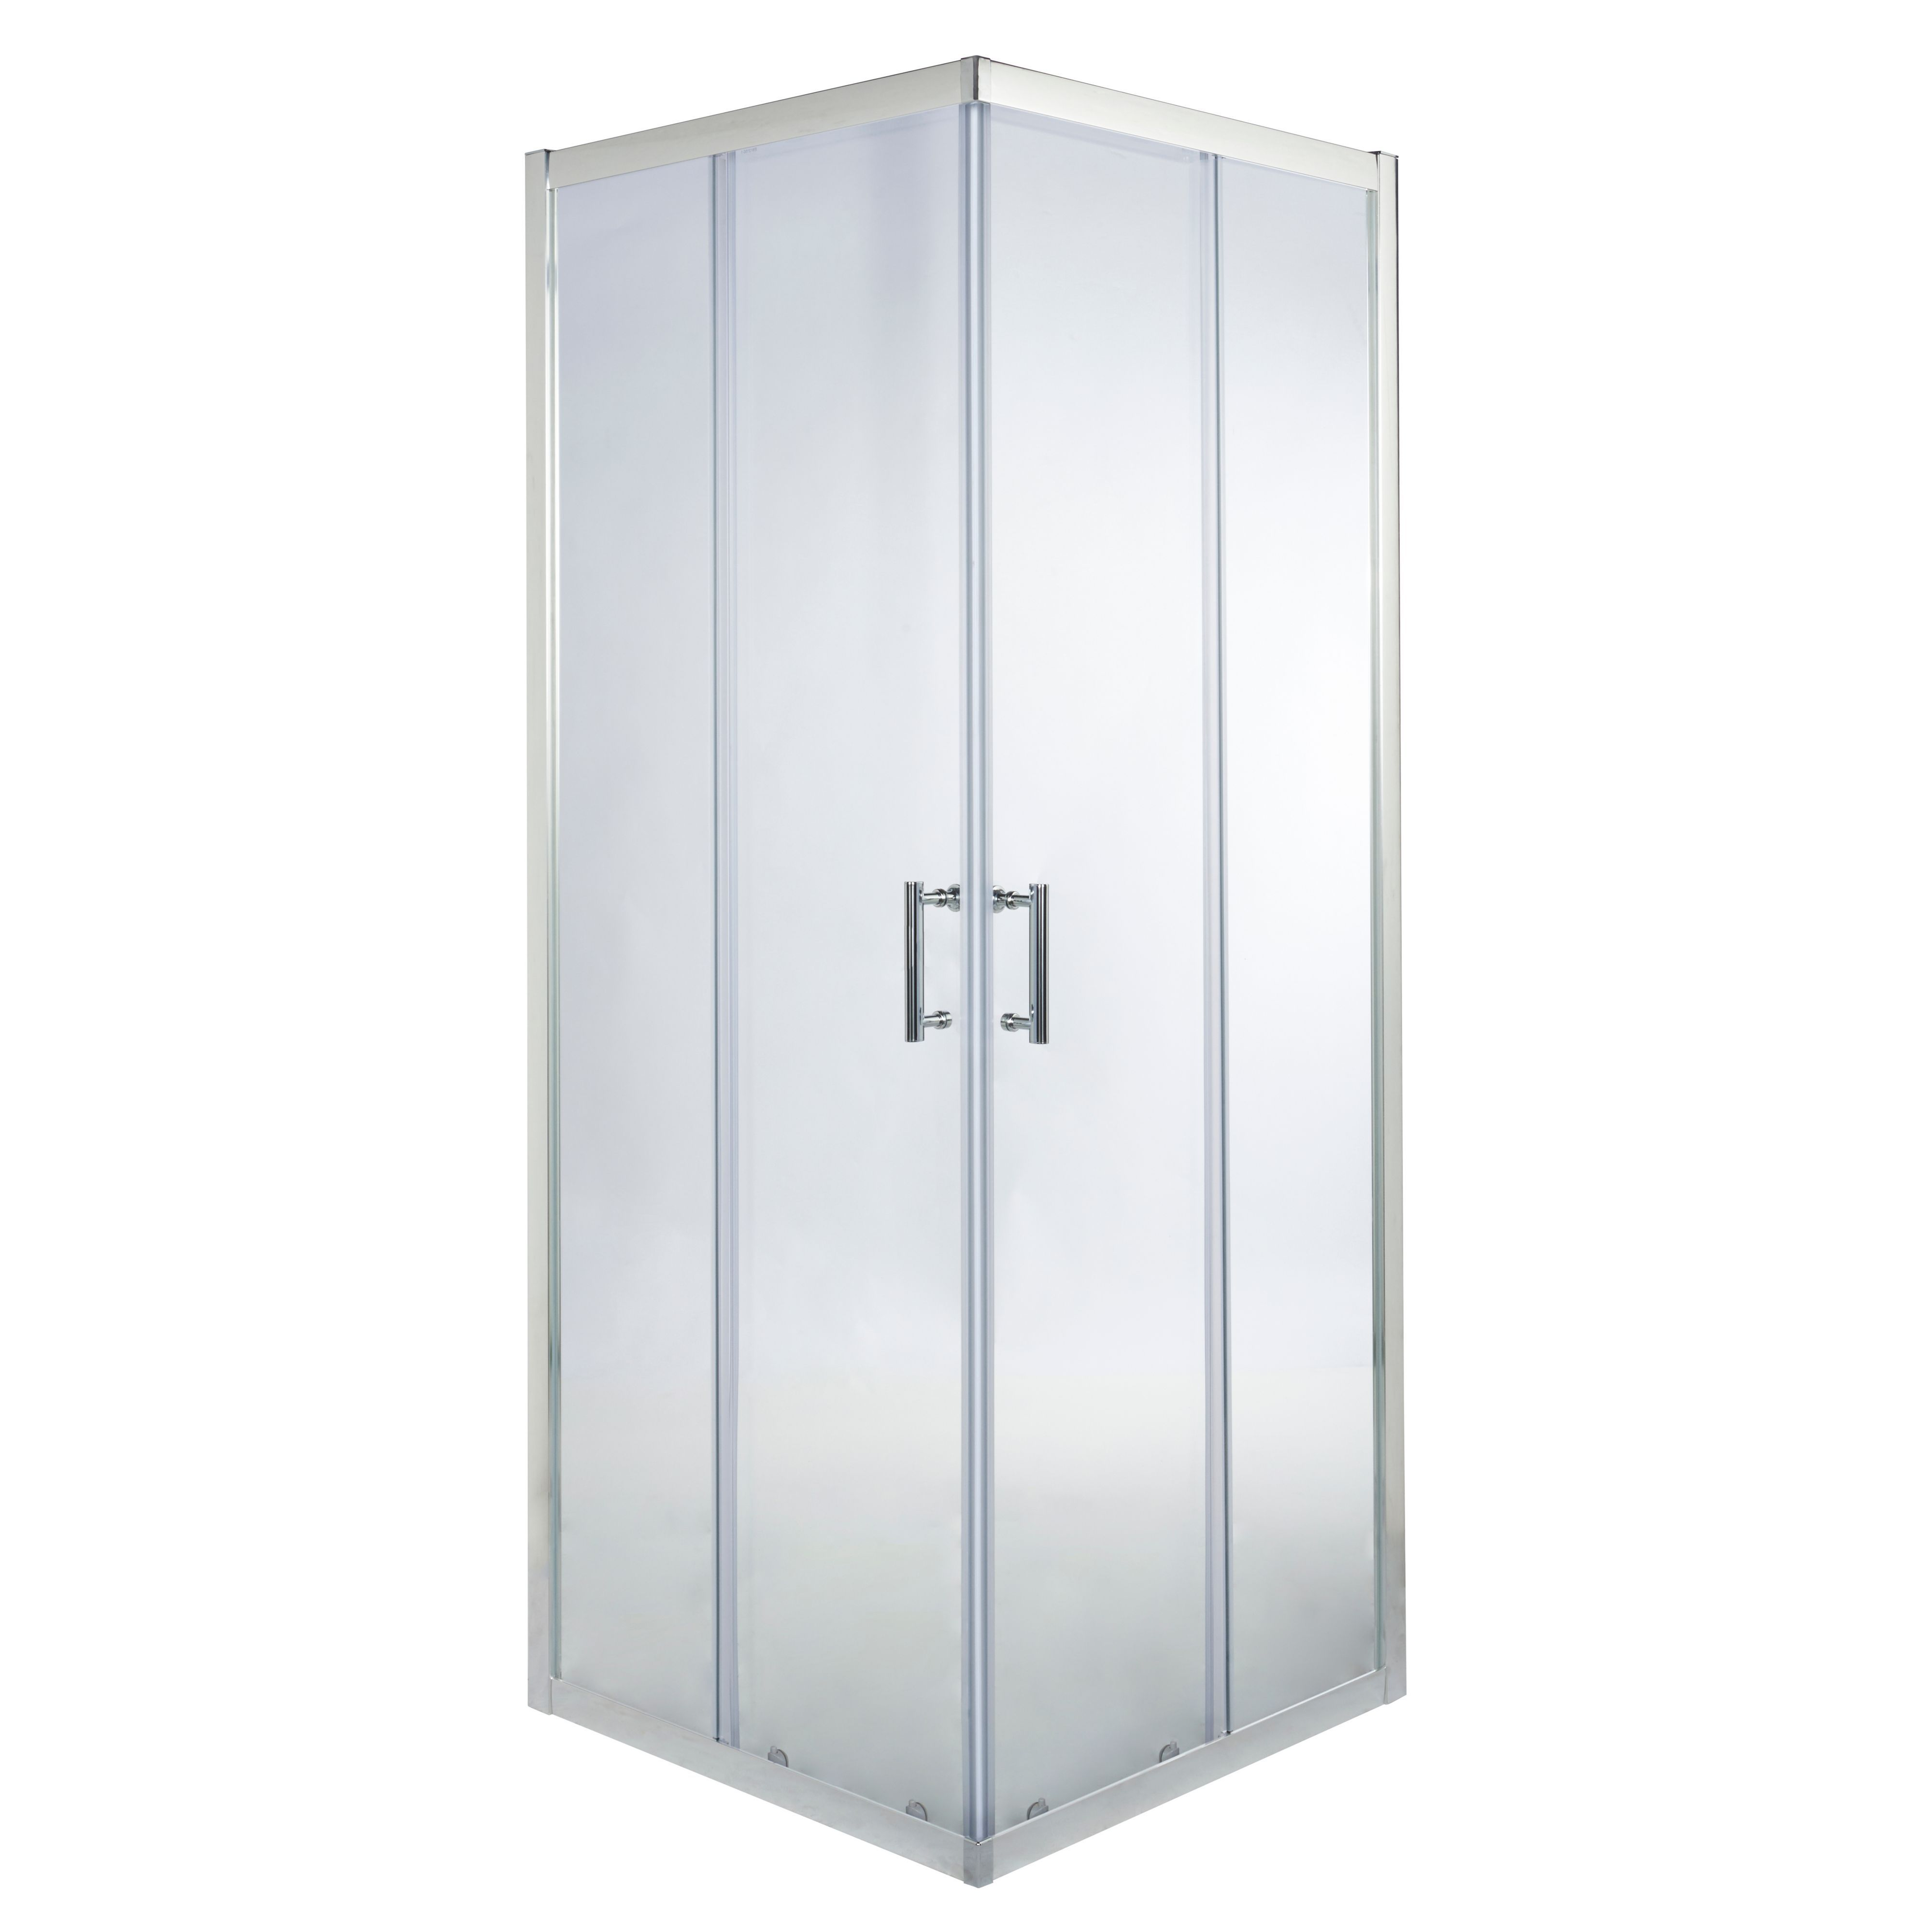 Cooke & Lewis Onega Square Shower Enclosure With Corner Entry Double Sliding Door (w)800mm (d)800mm